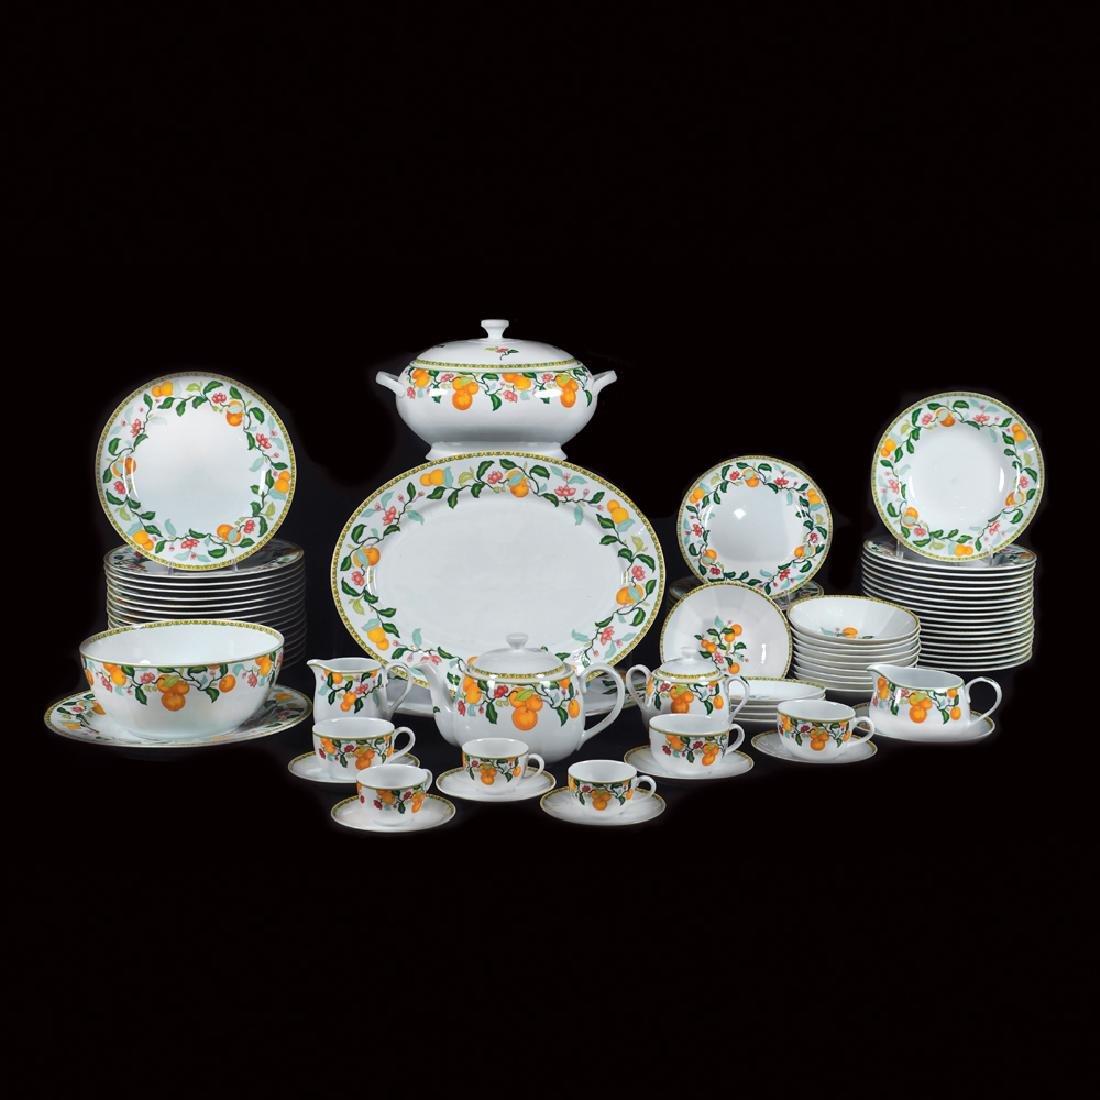 A Vista Alegre porcelain plate service (145) Portugal